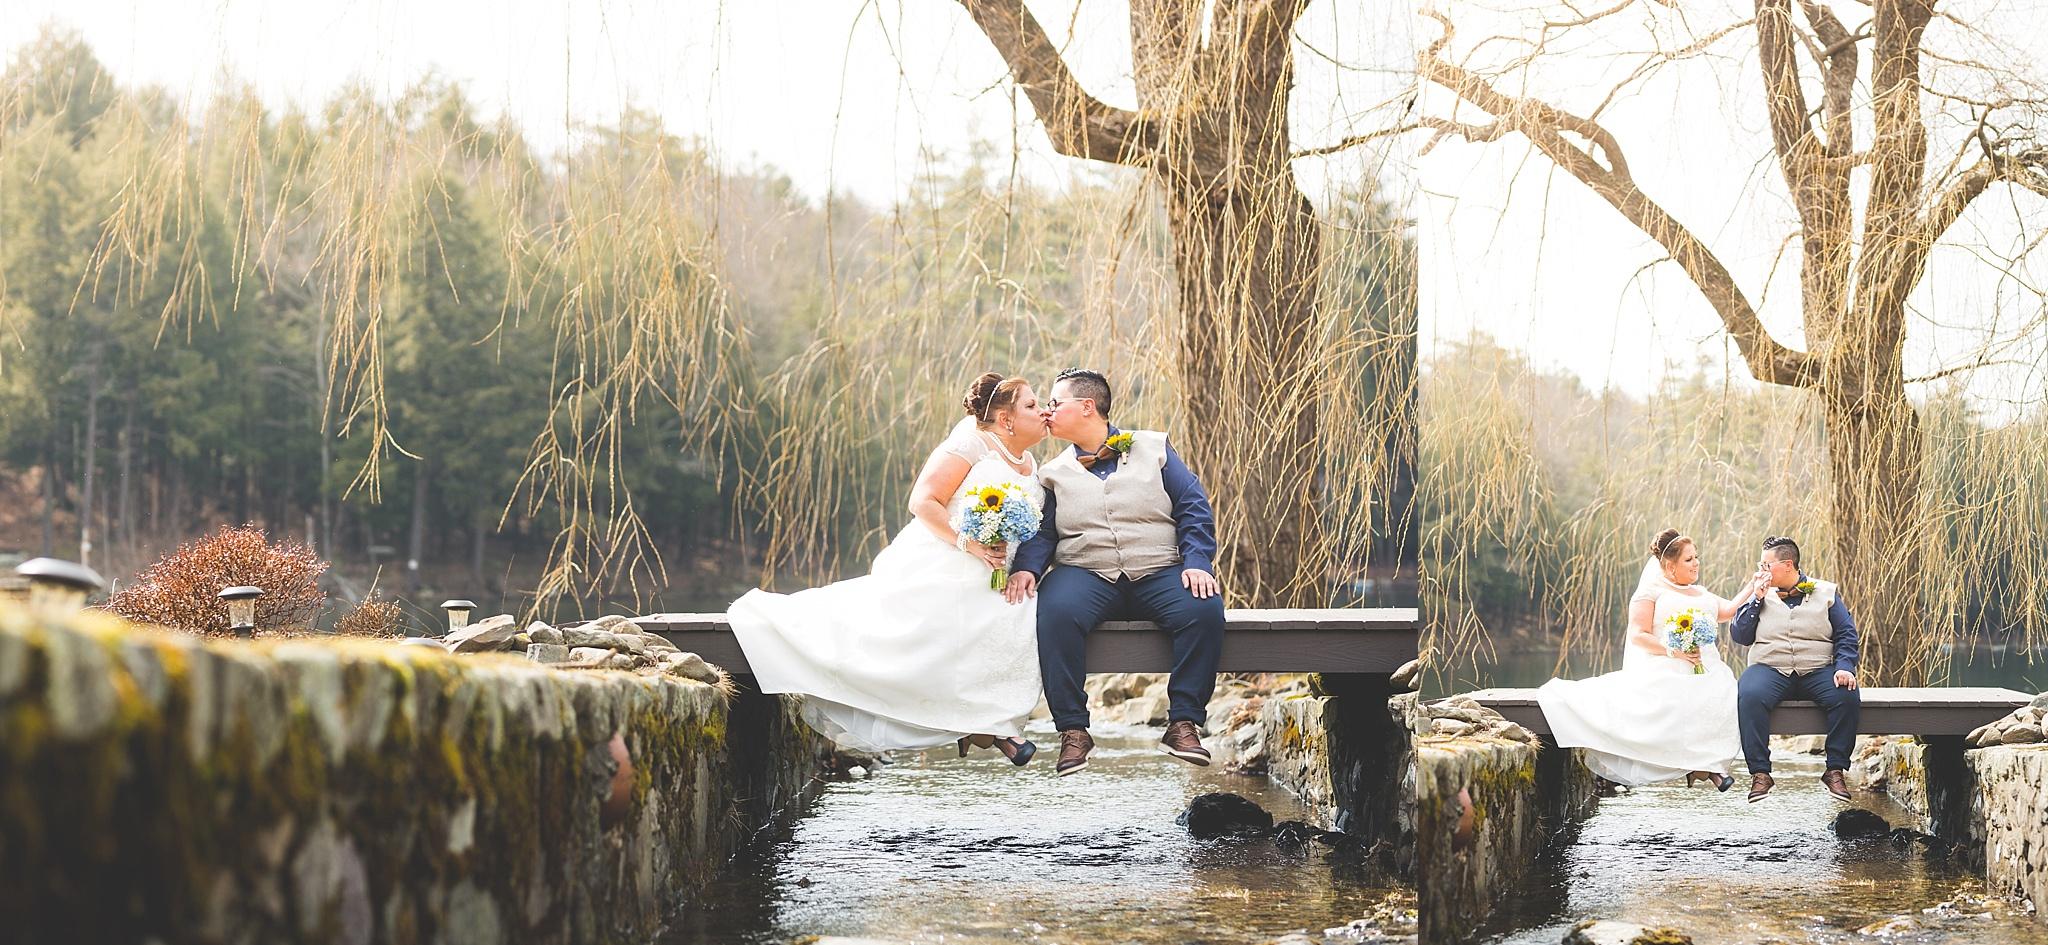 Albany_Wedding_Photographer_1650.jpg